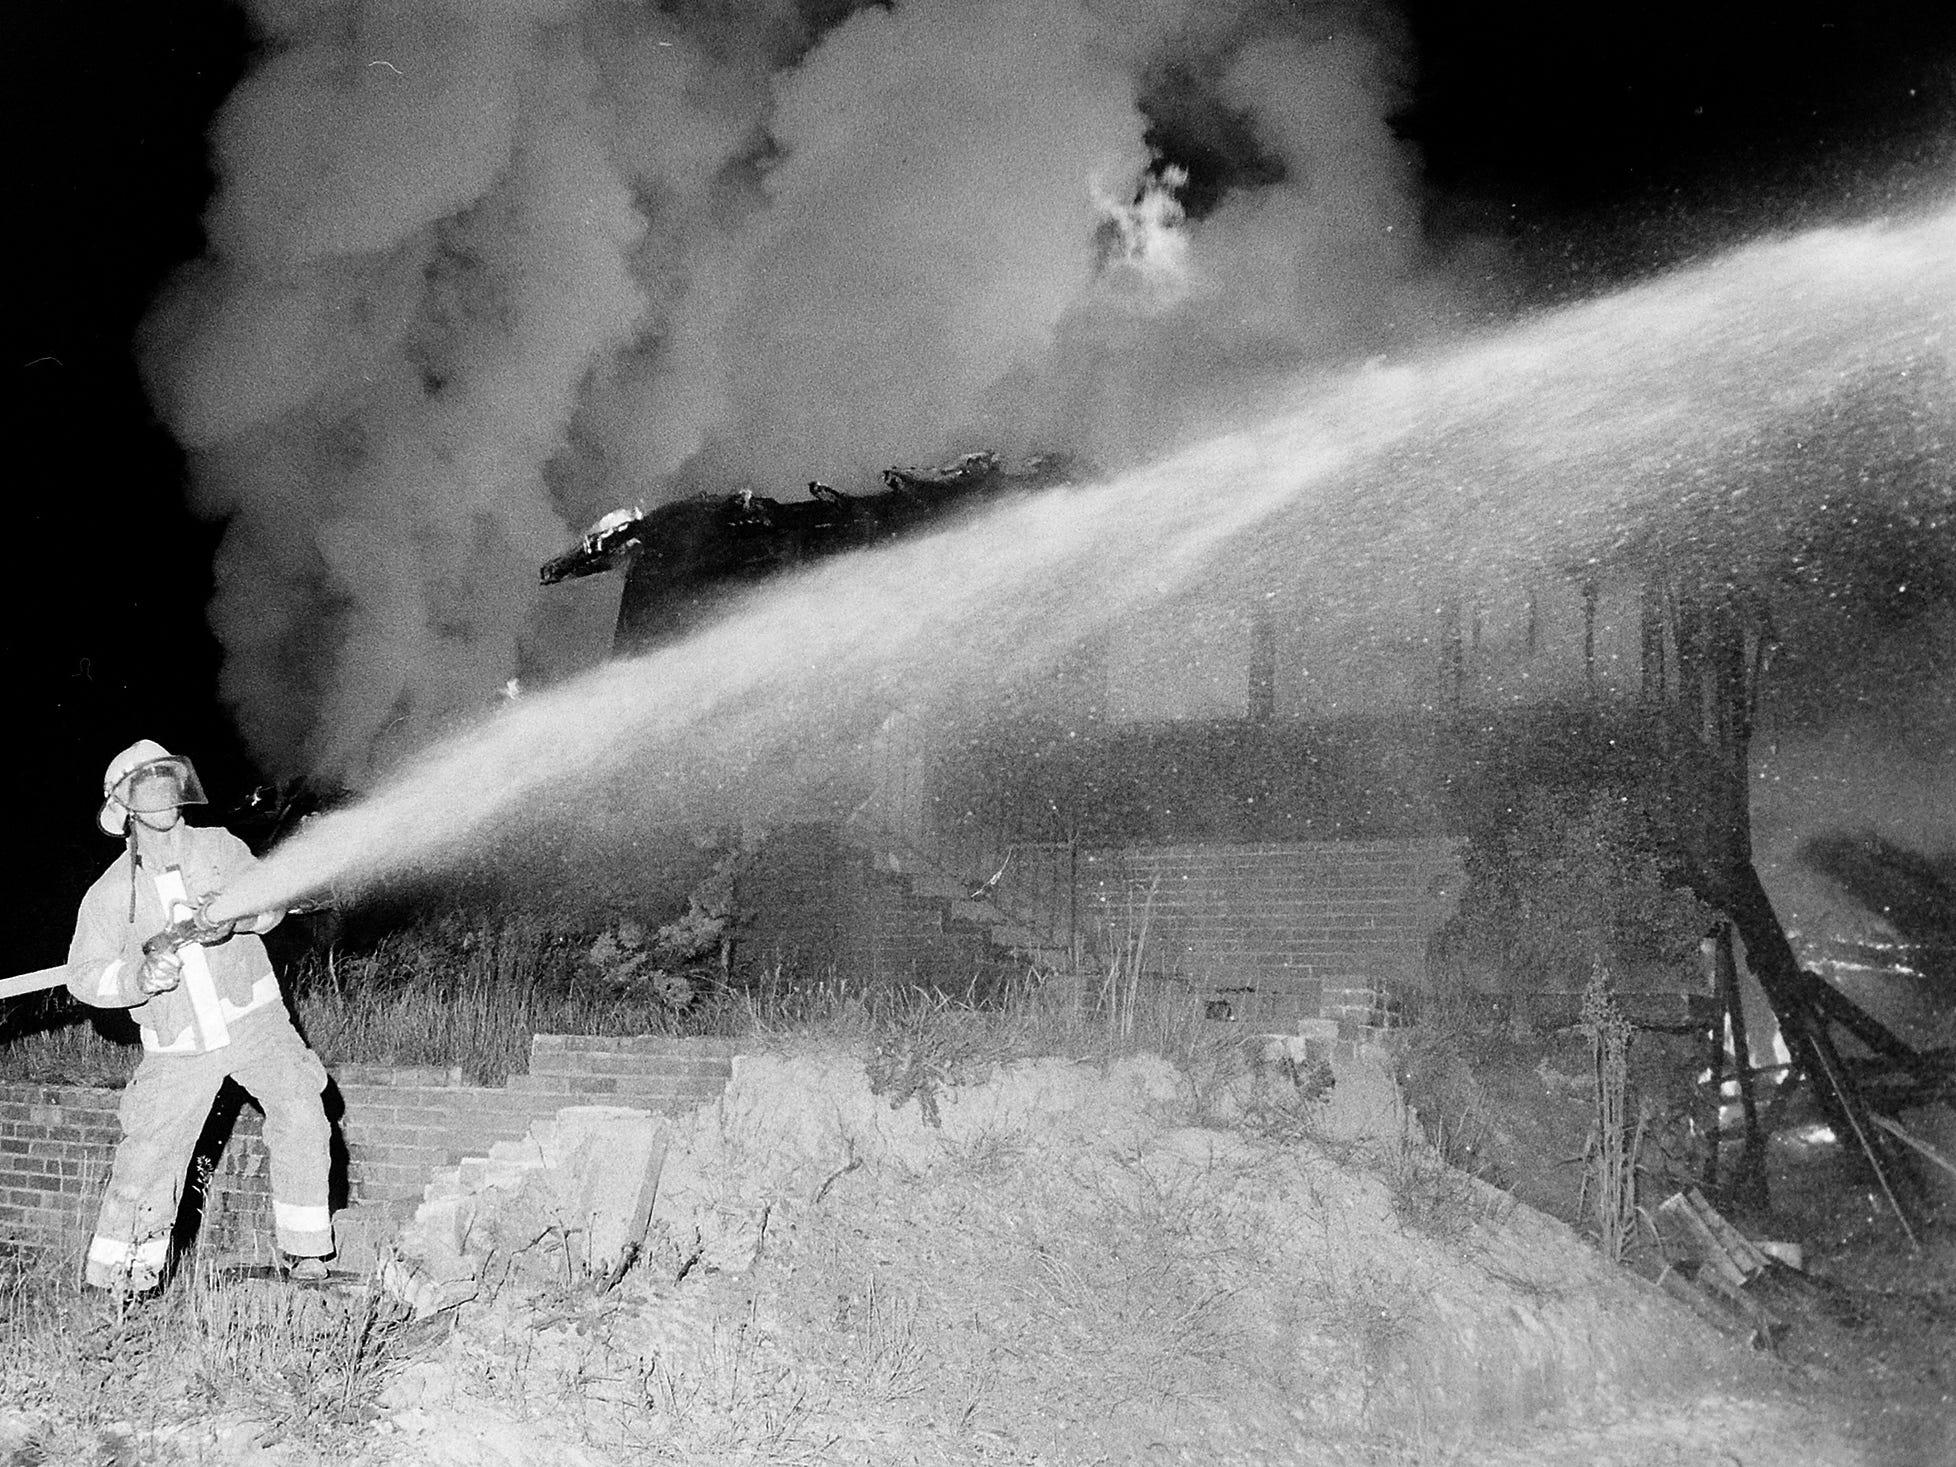 06/04/86House Fire